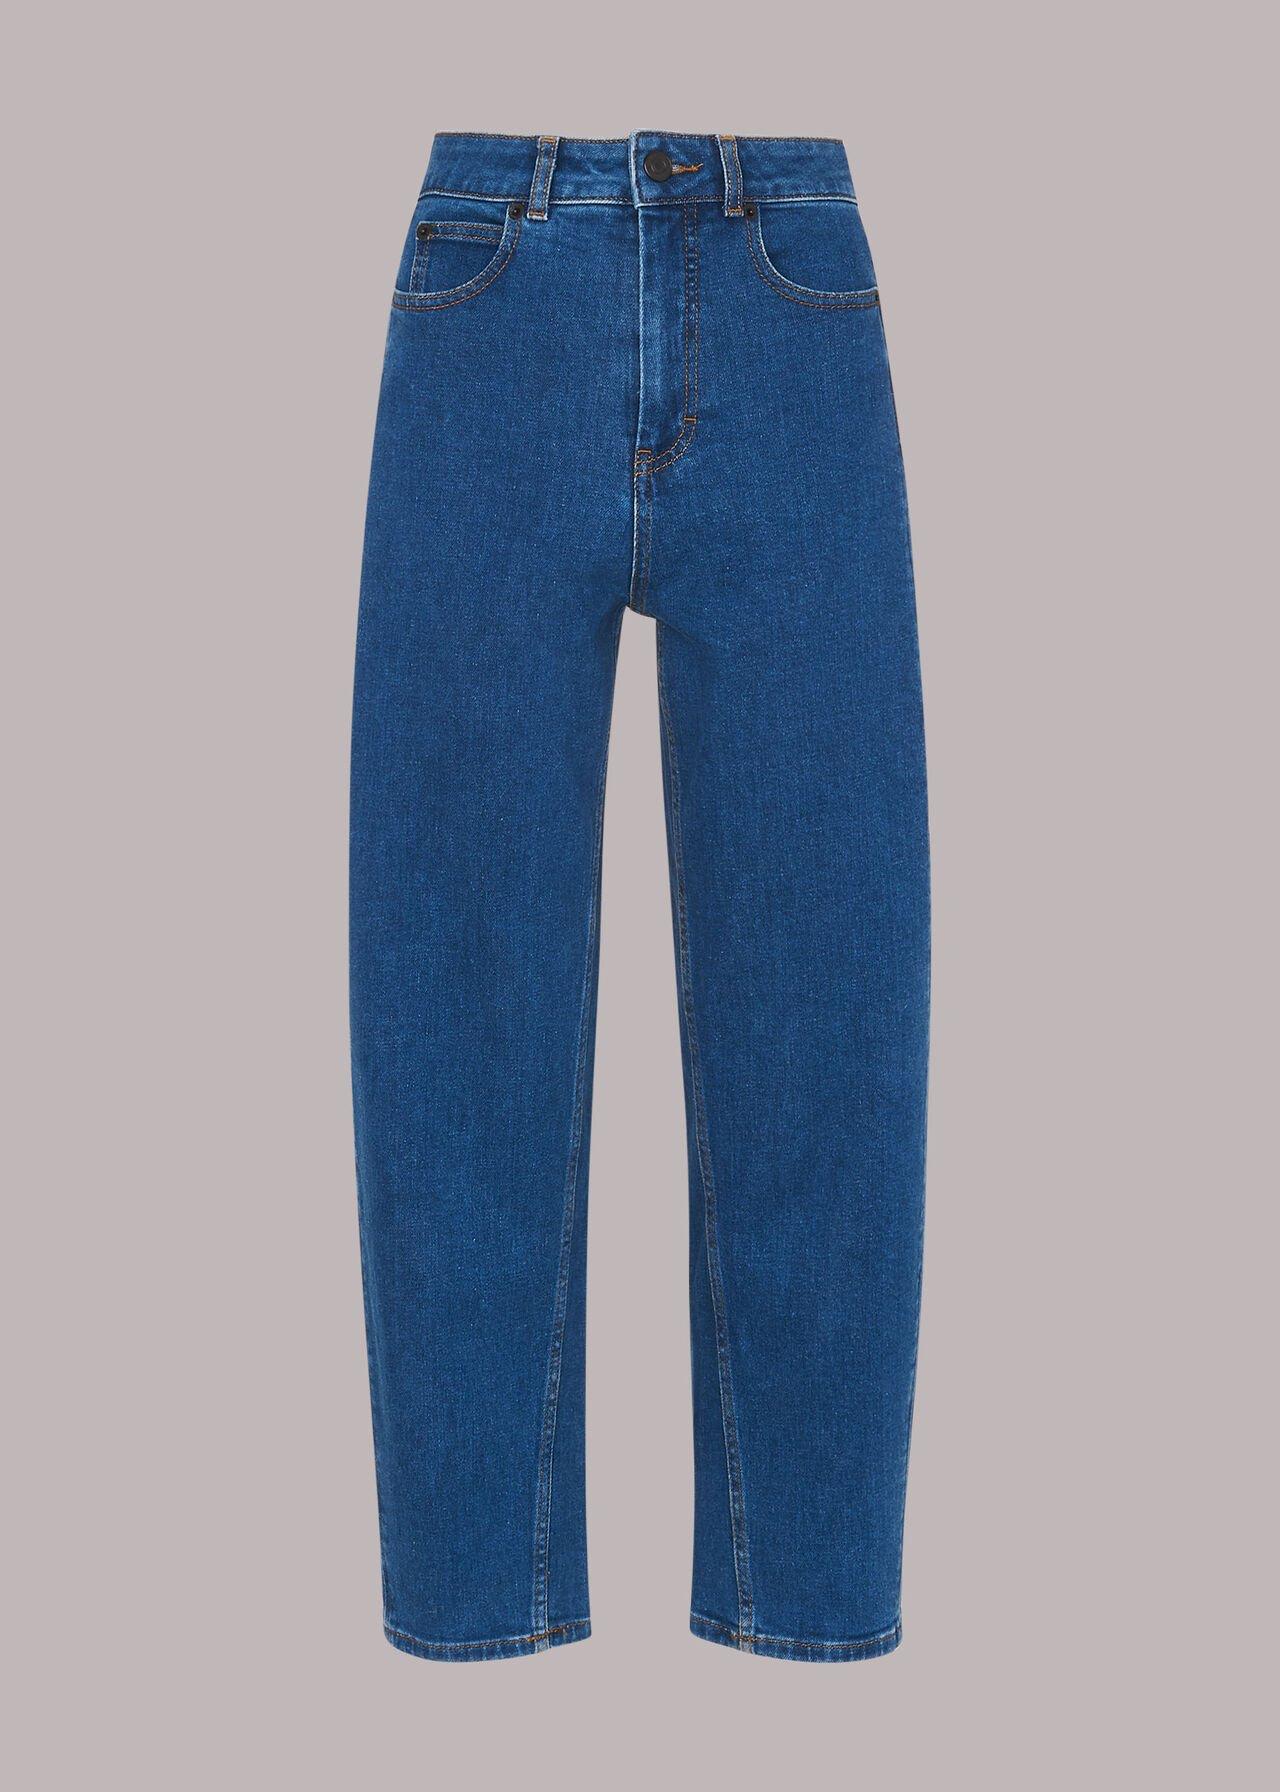 High Waist Barrel Jean